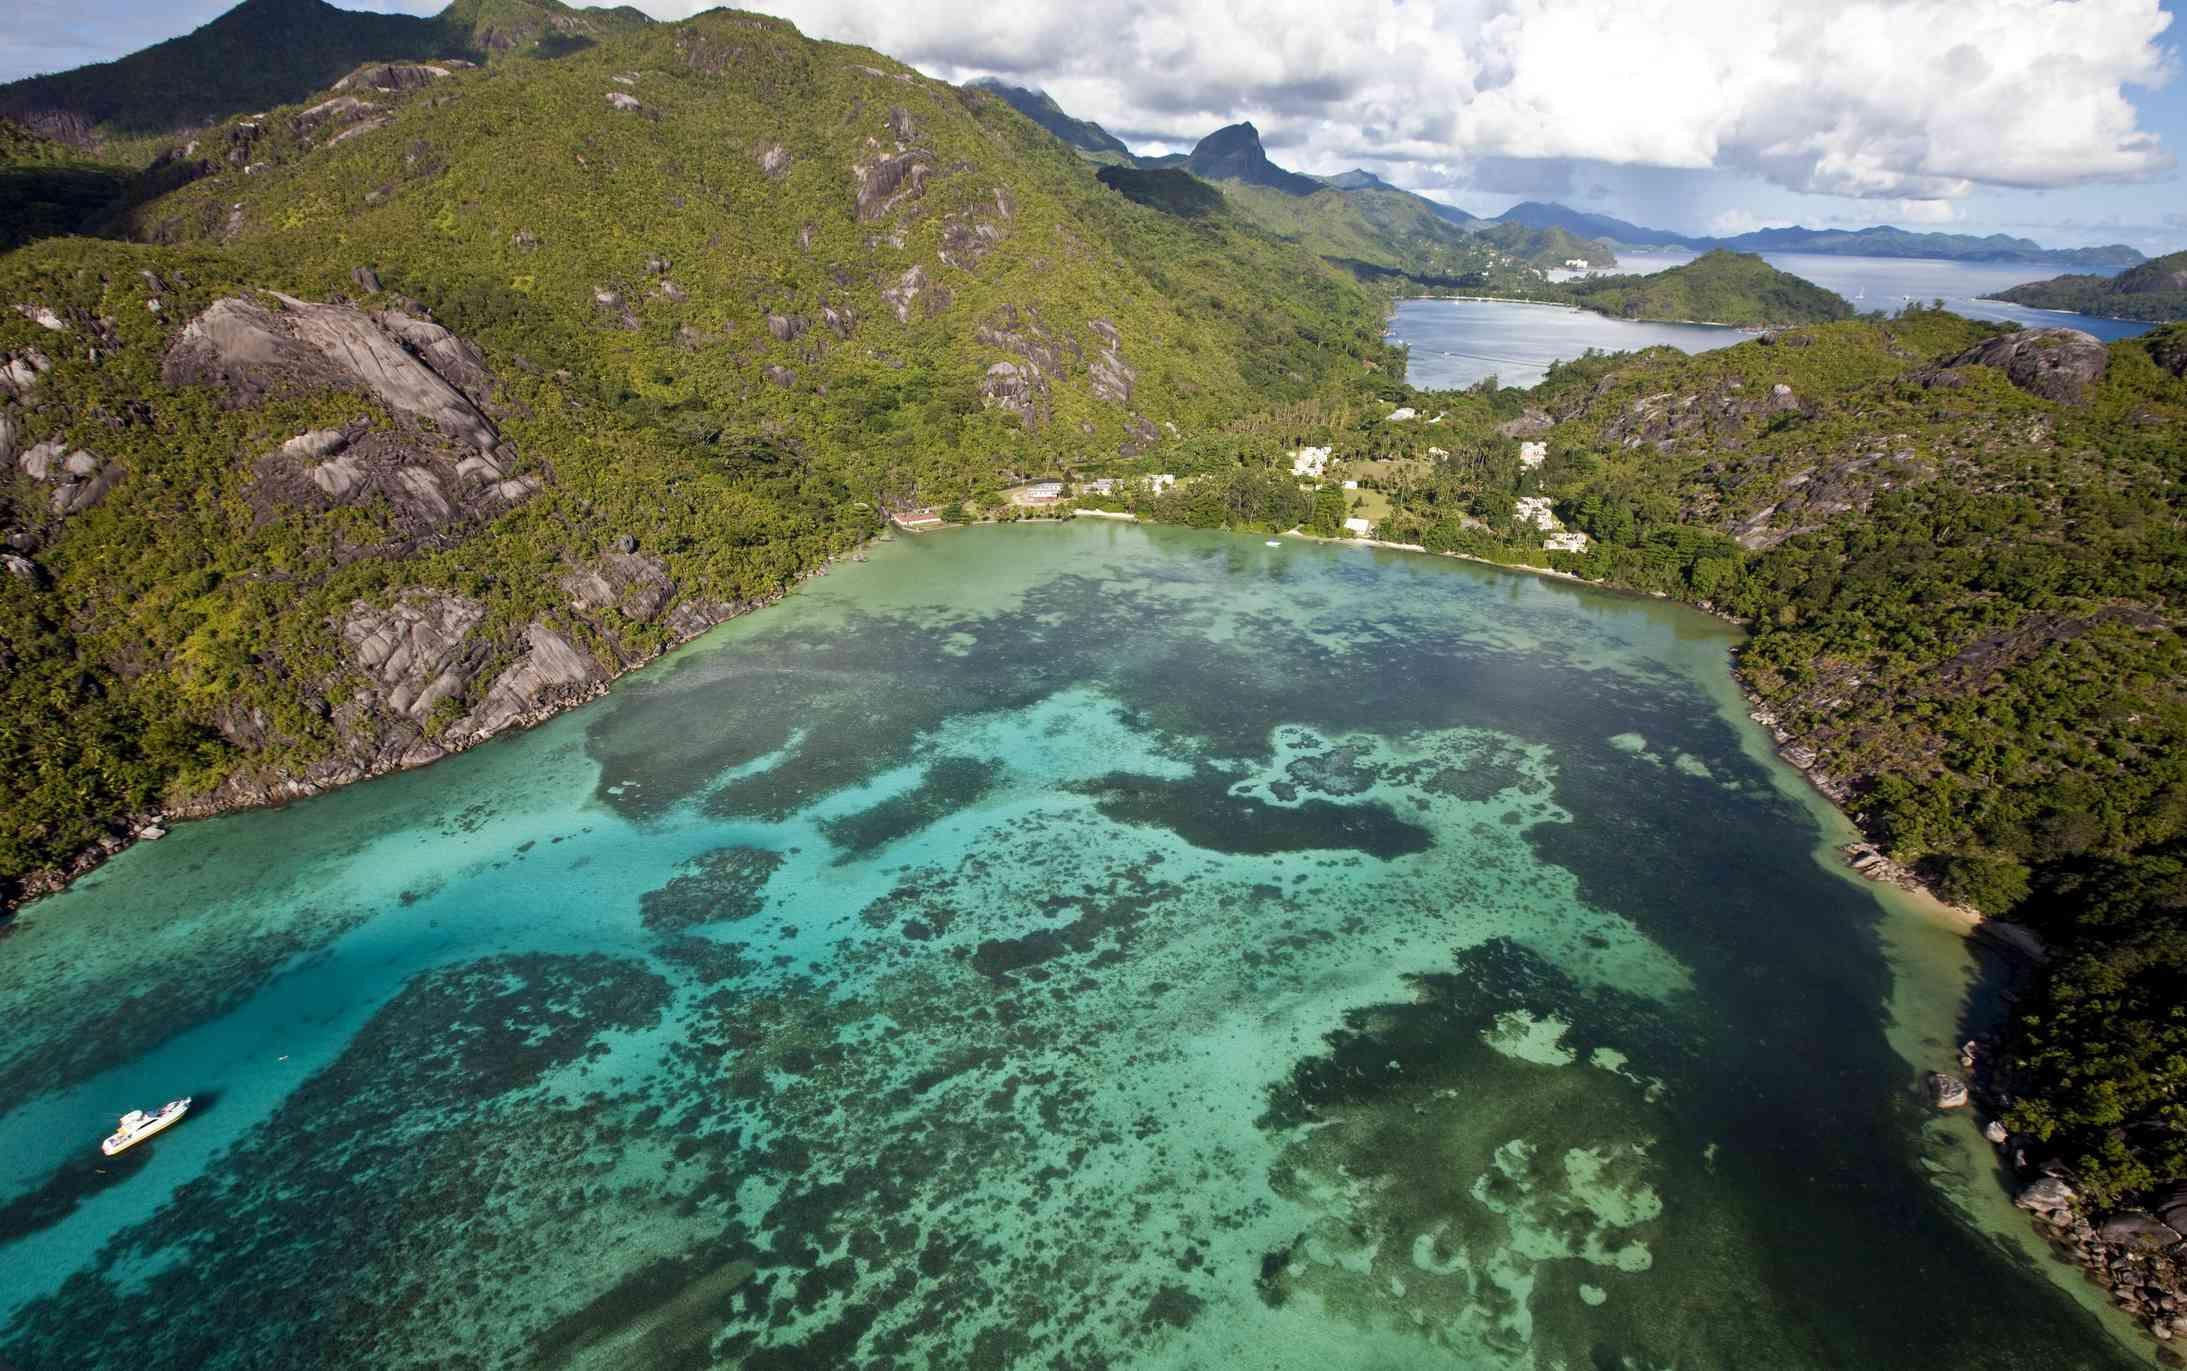 The bay of Baie Ternay, Mahe Island, Seychelles